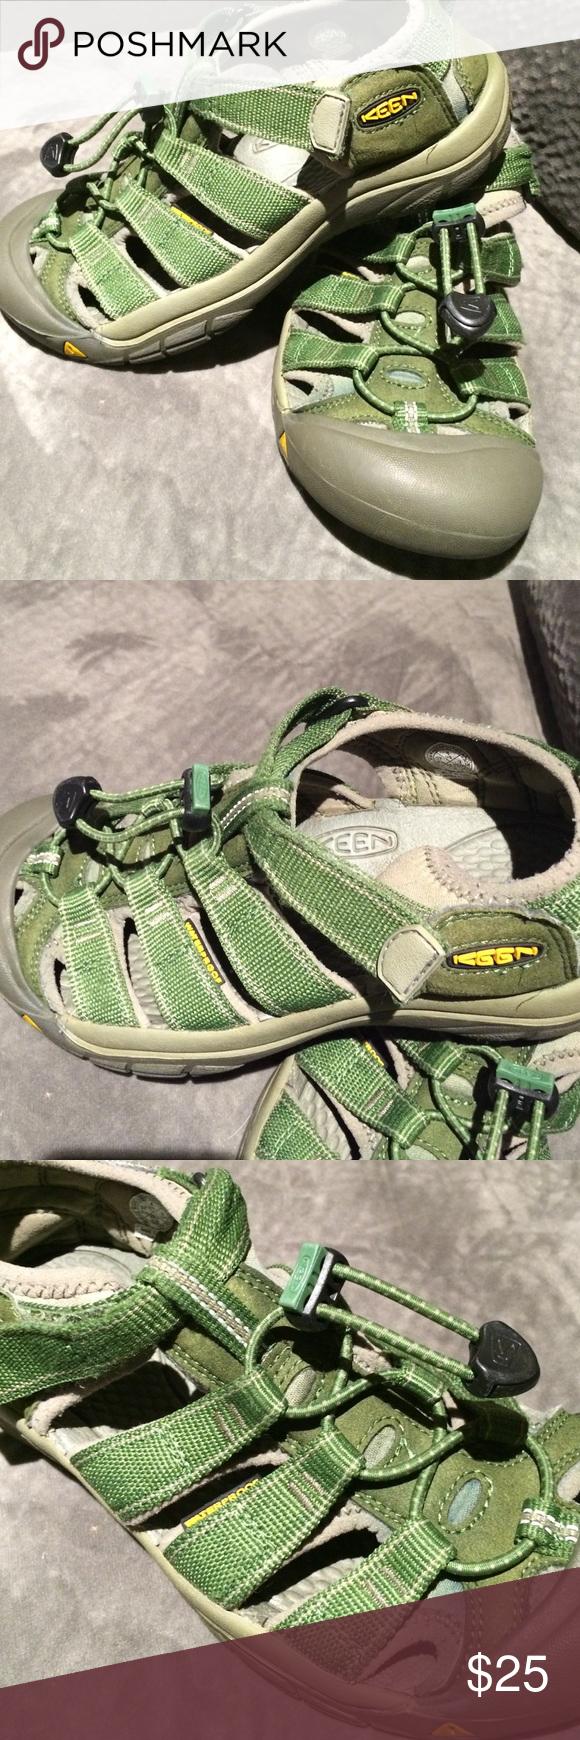 Keens green sandals size 4 unisex Loved but still have lots of life Shoes Sandals & Flip Flops